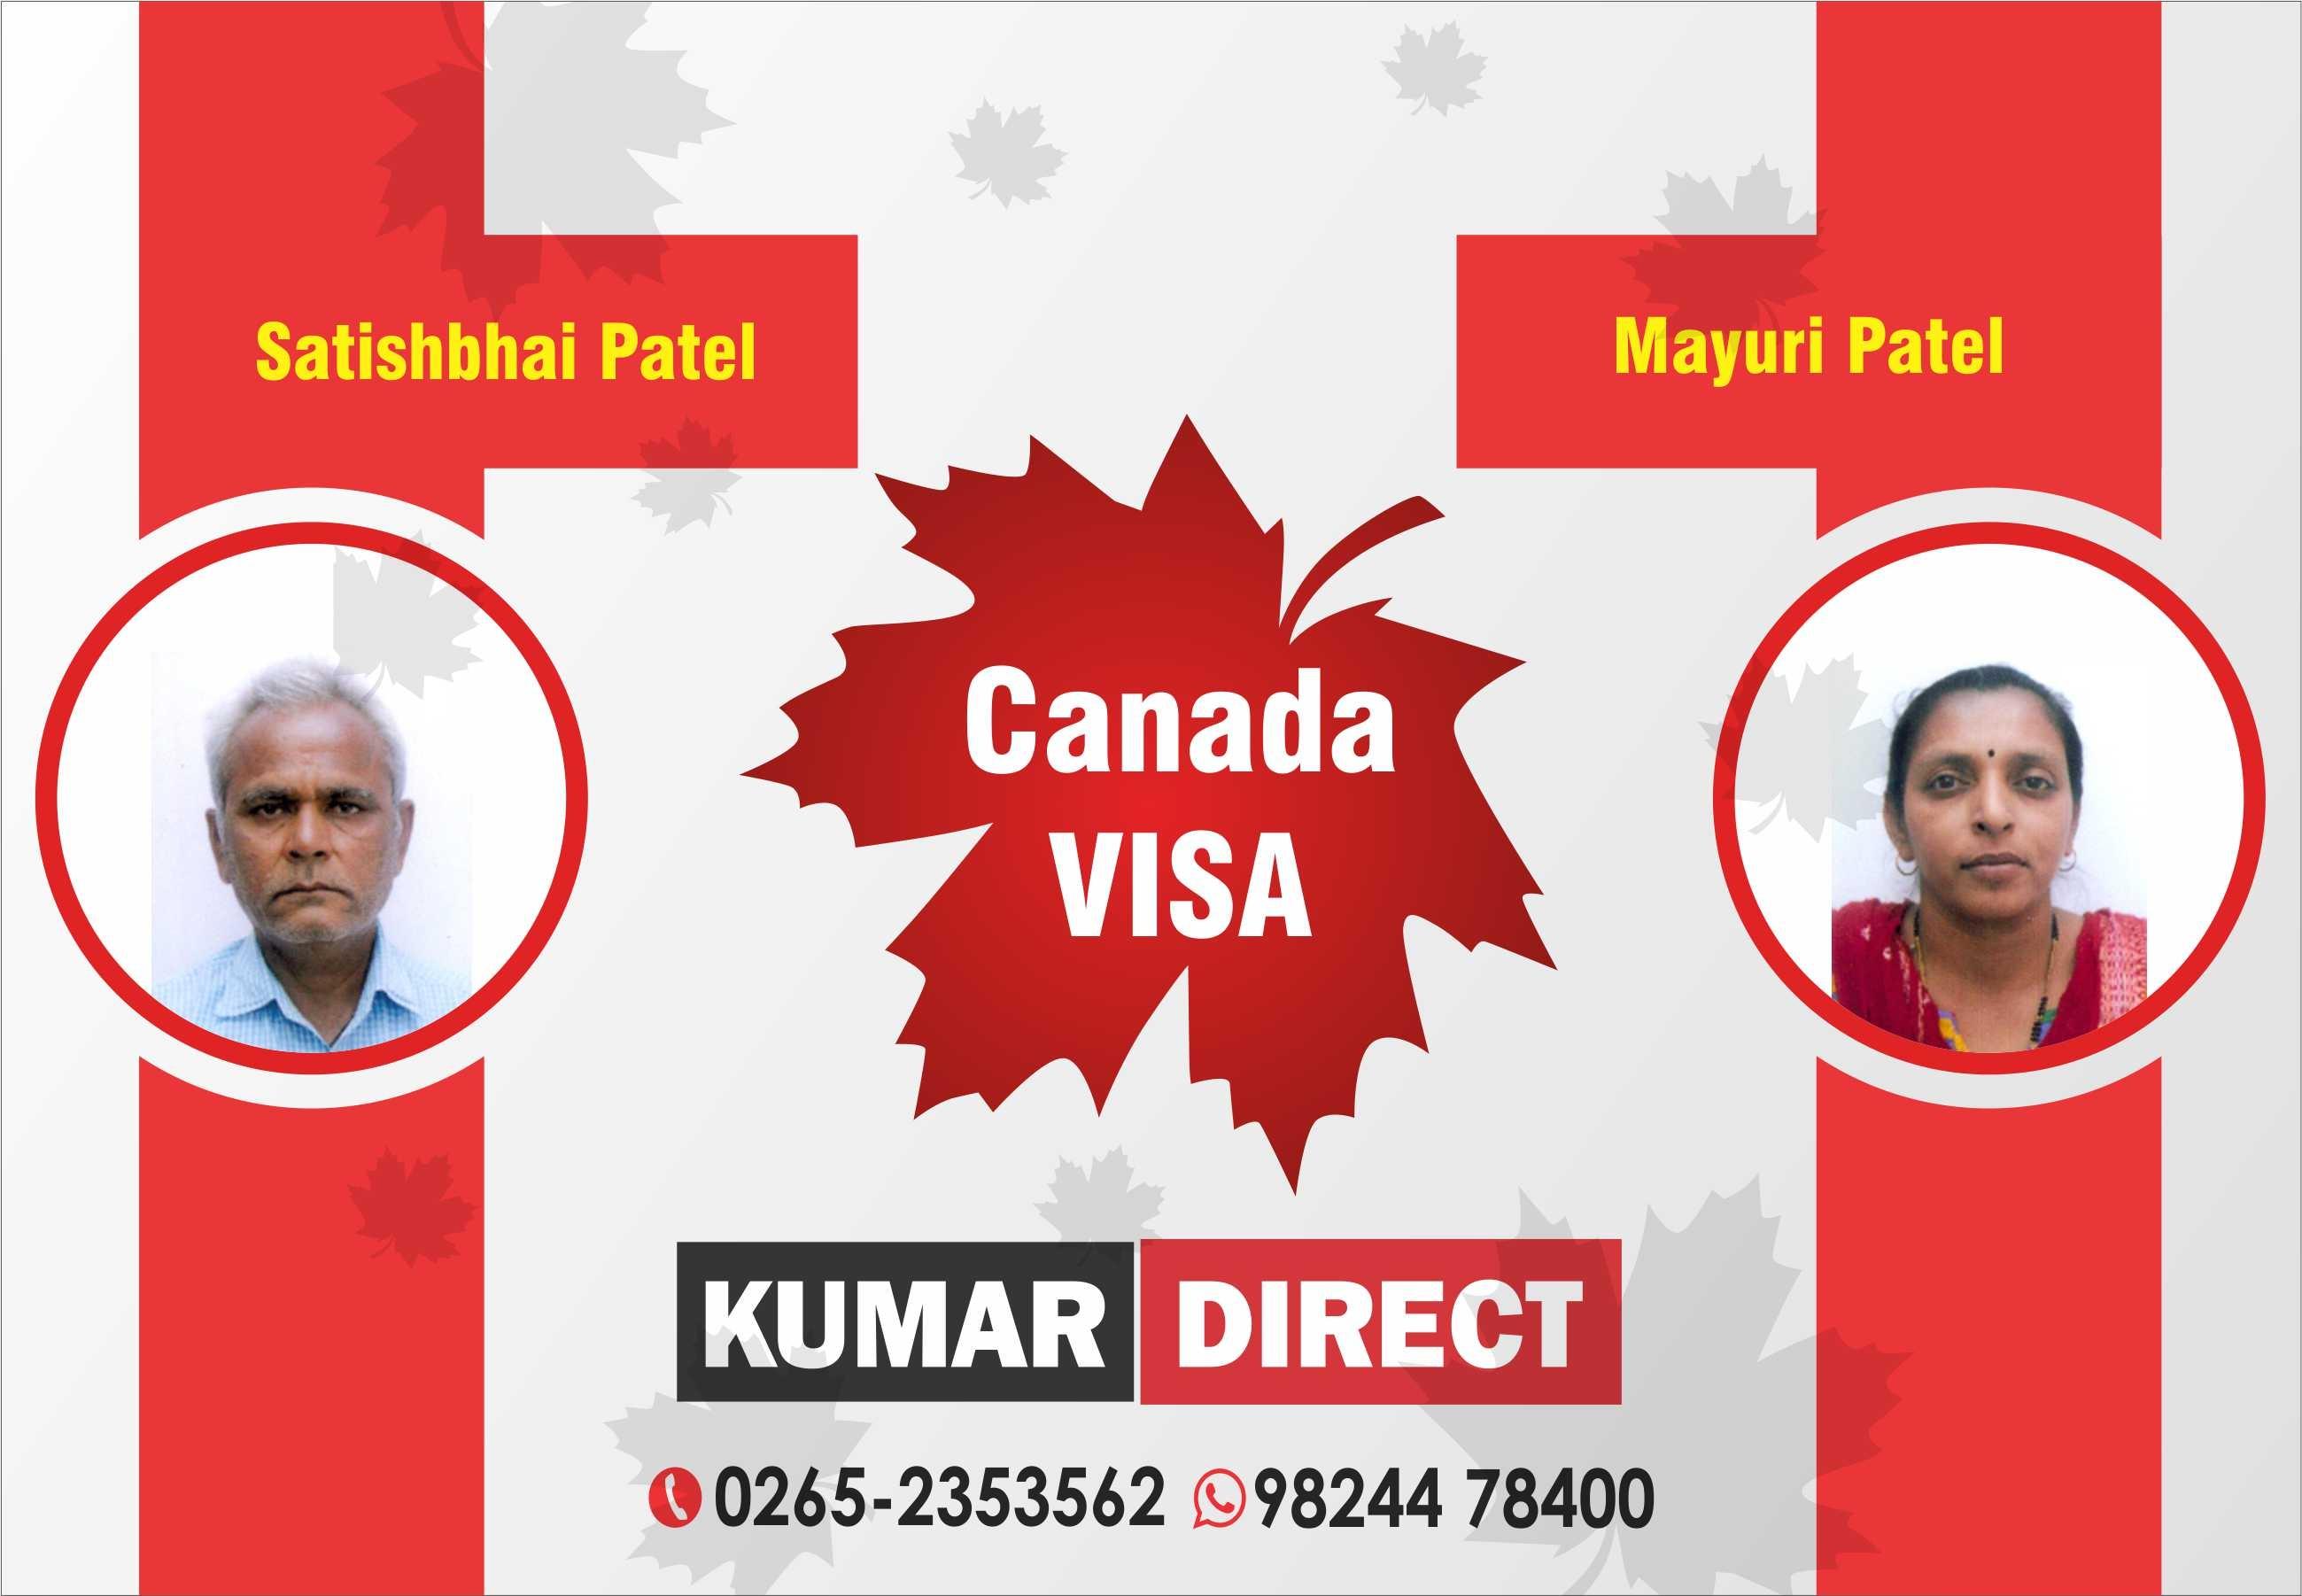 SATISHBHAI PATEL & MAYURI